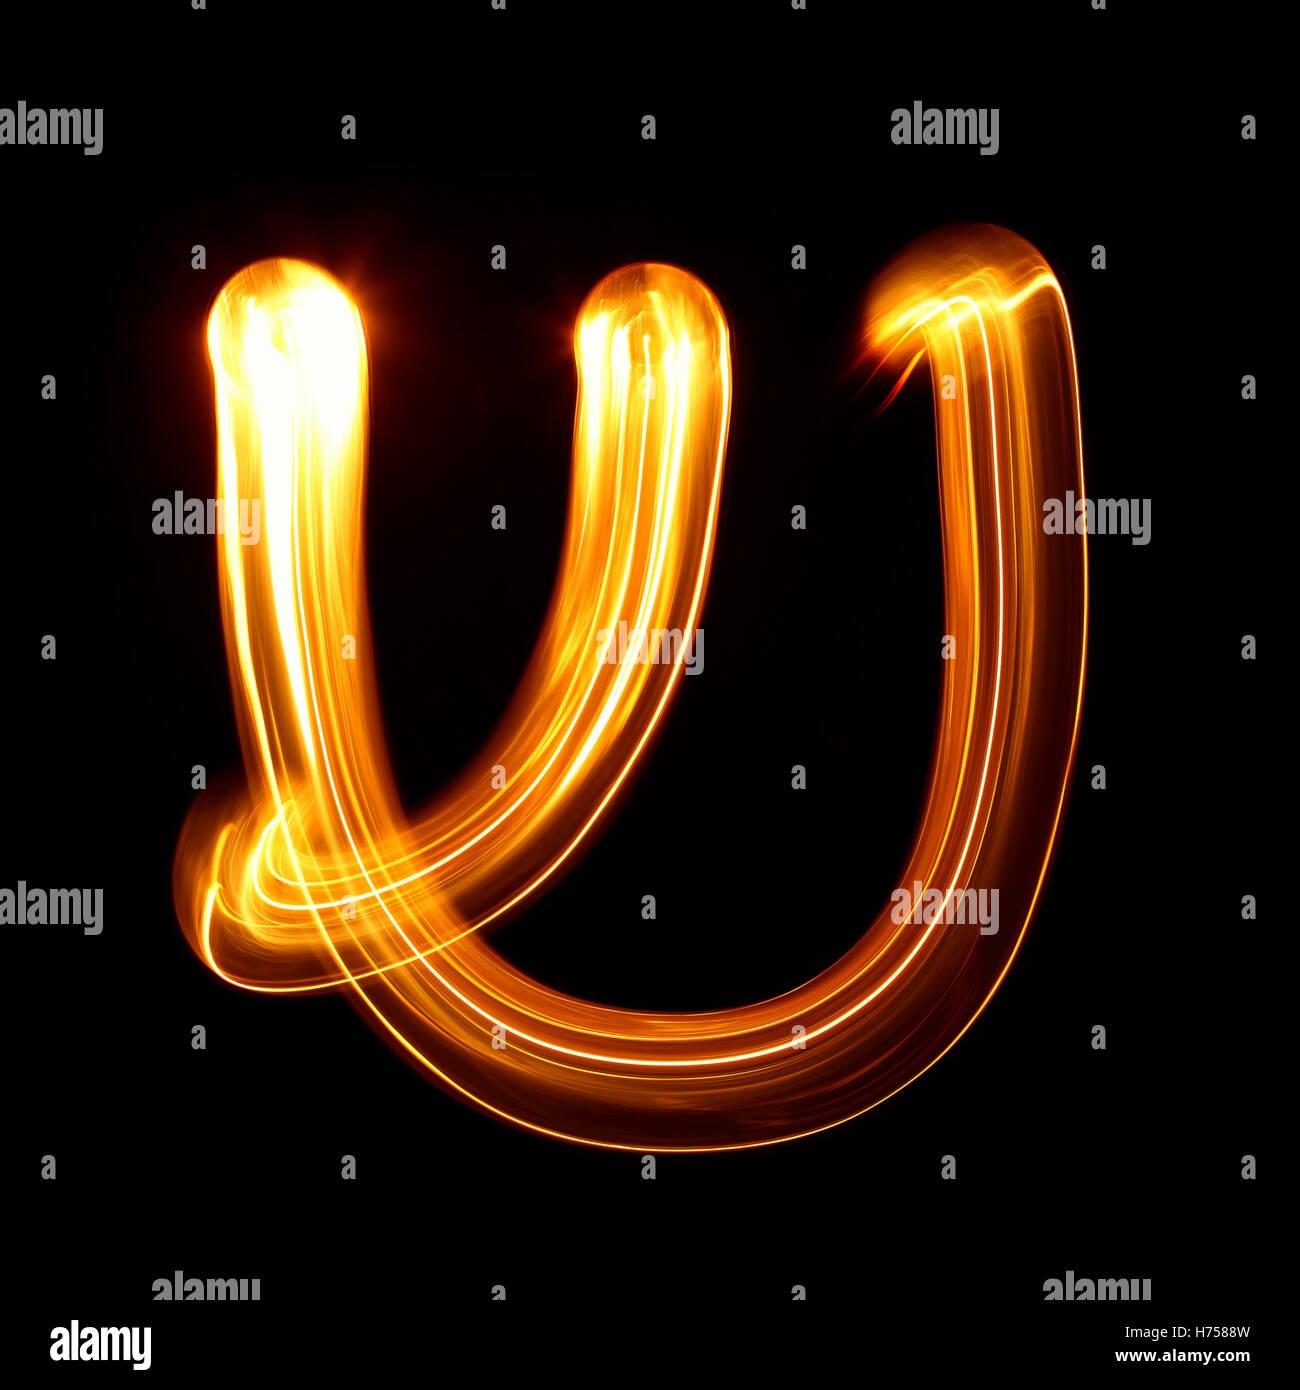 Shin - Letters of hebrew alphabet - Stock Image